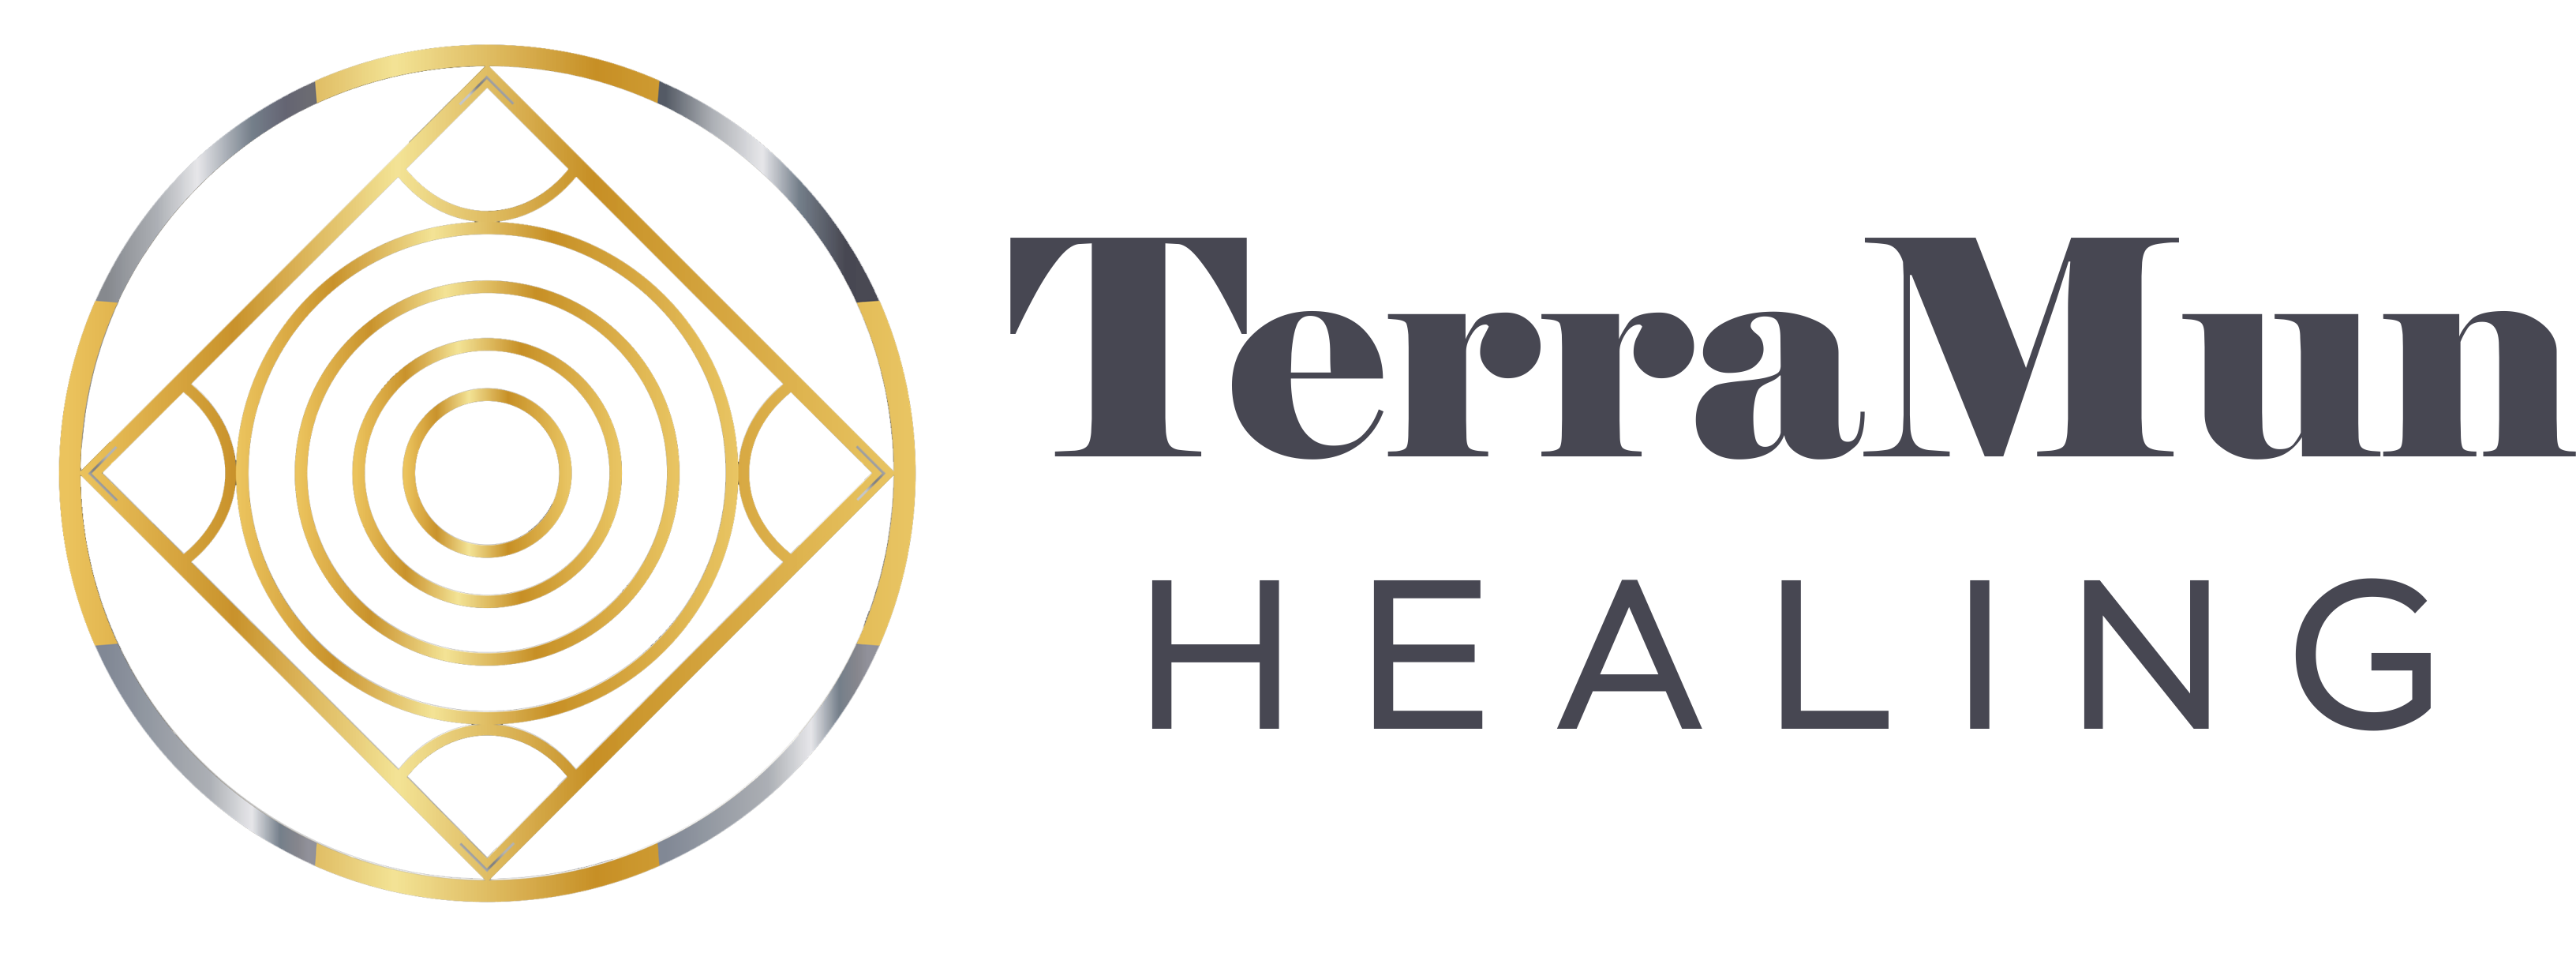 Terramun Healing